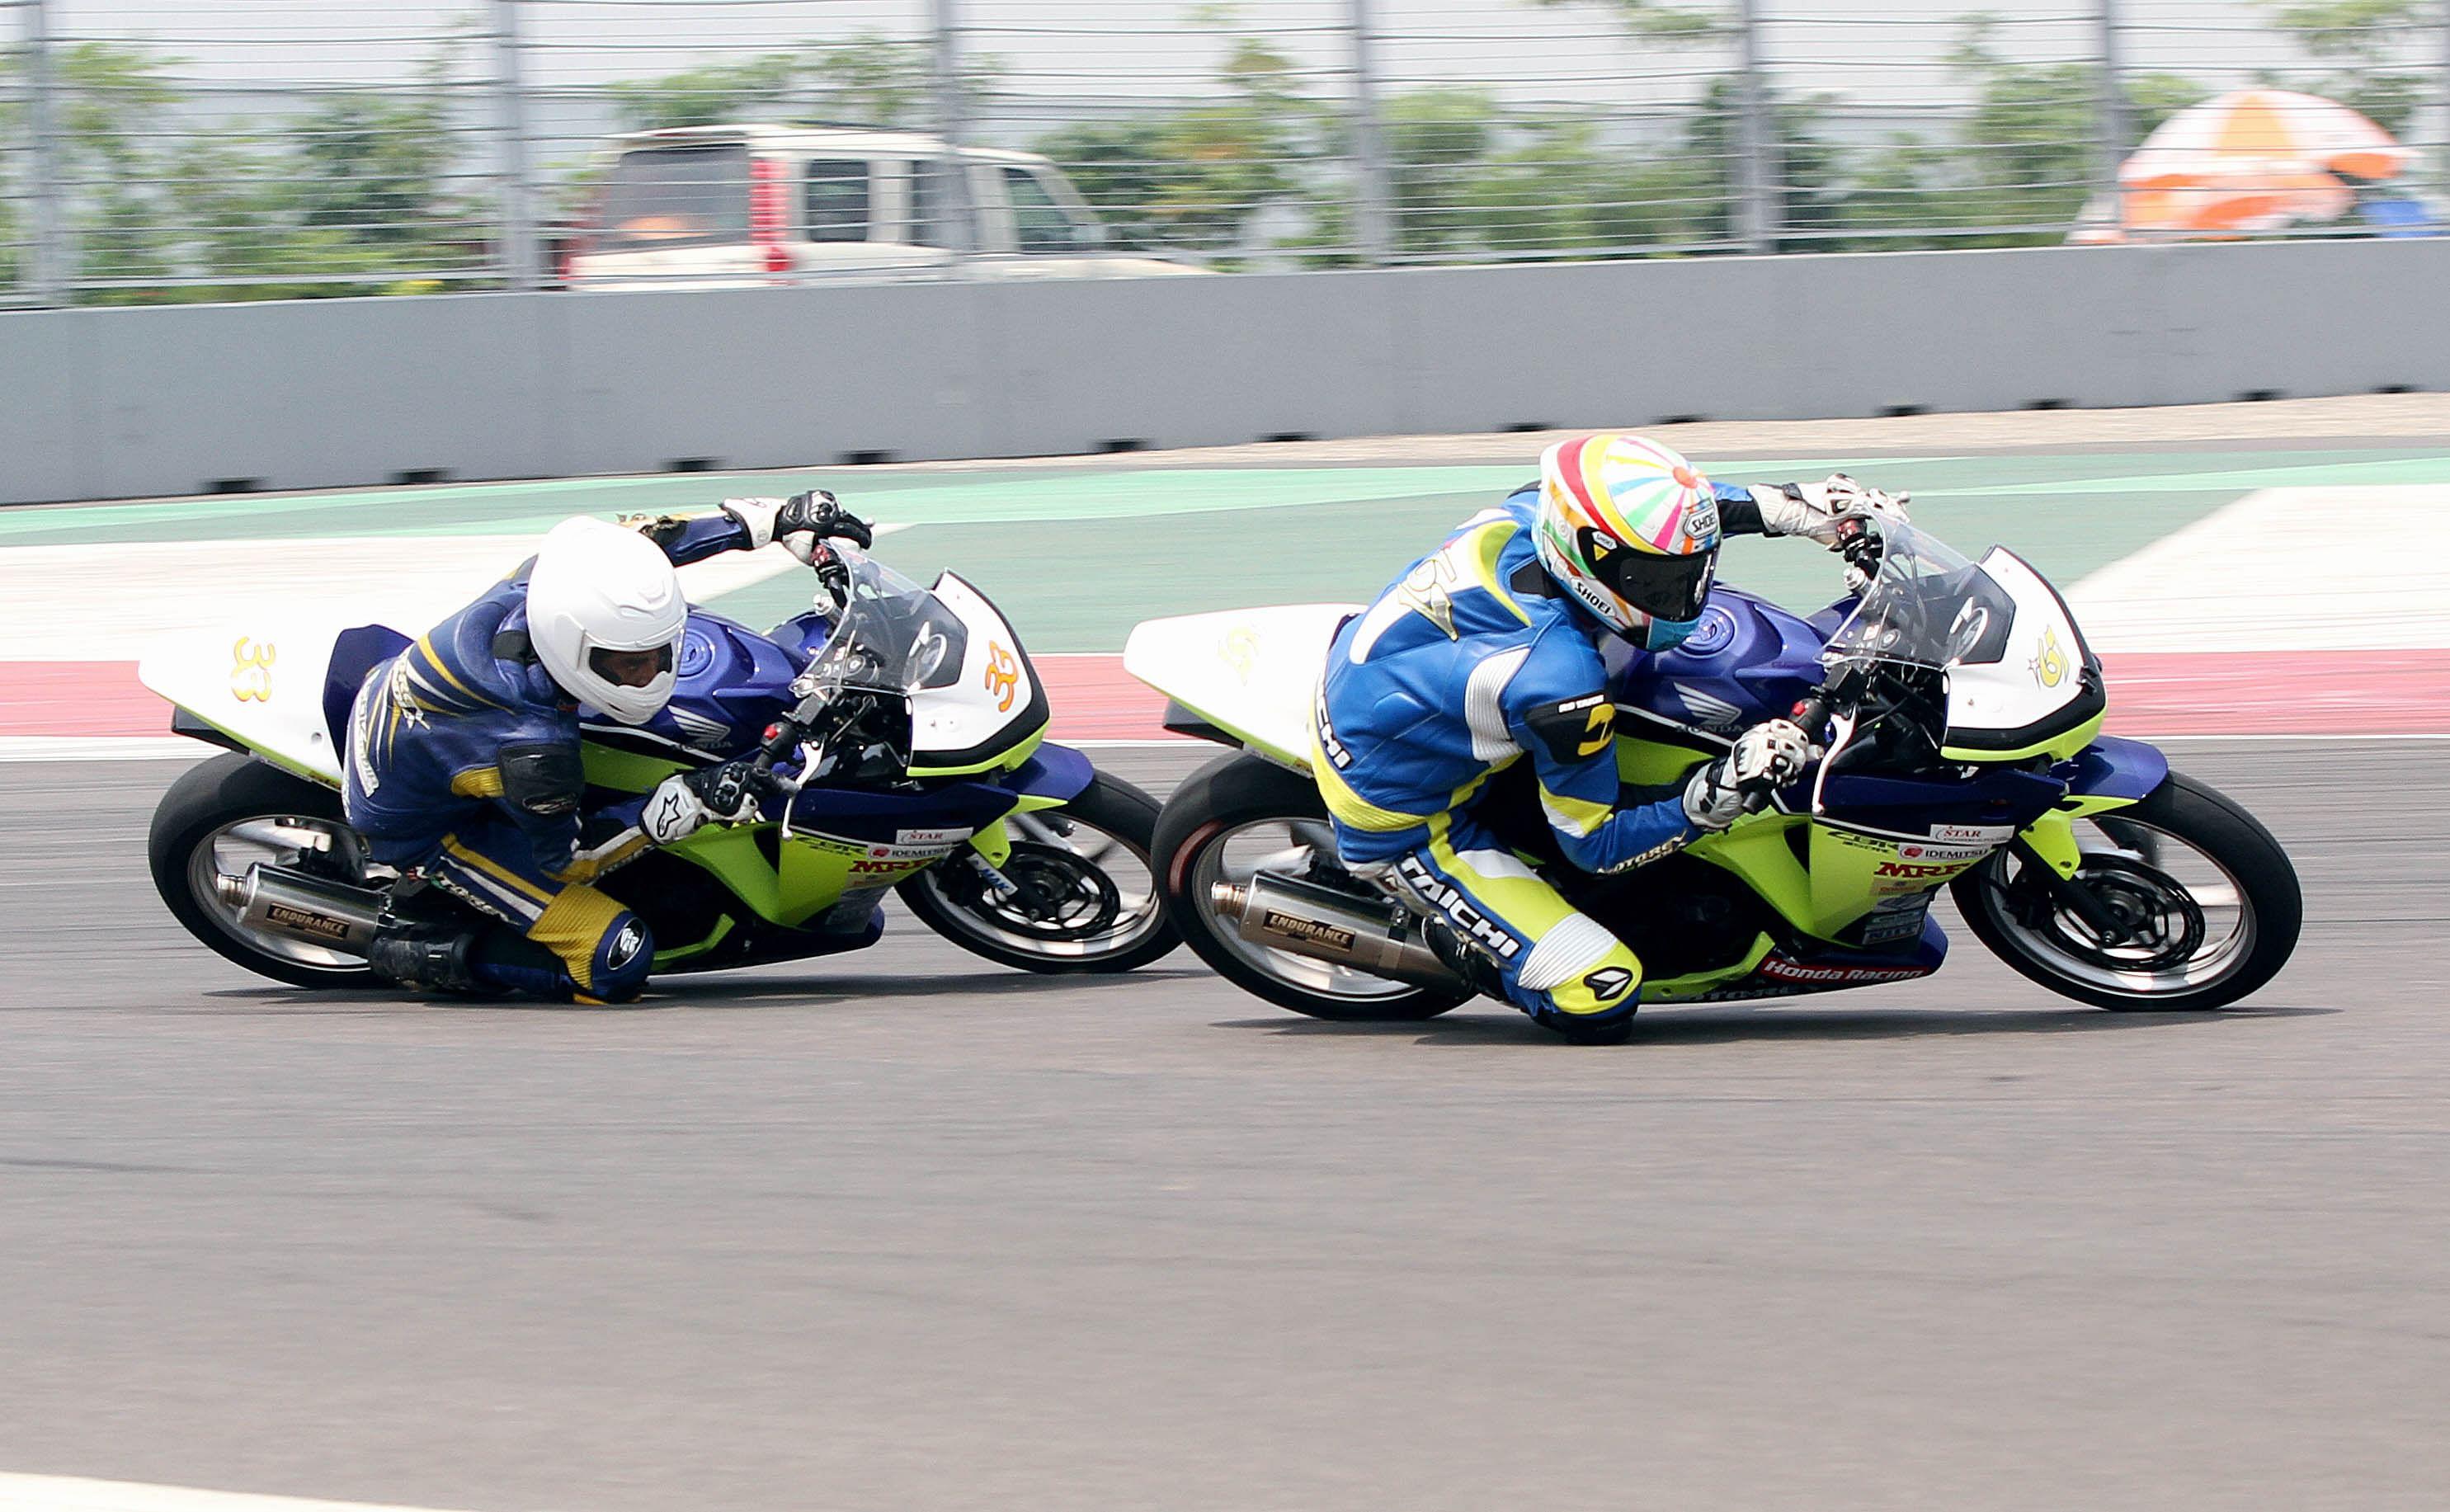 K Rajini (front) on way to winning Honda CBR Race